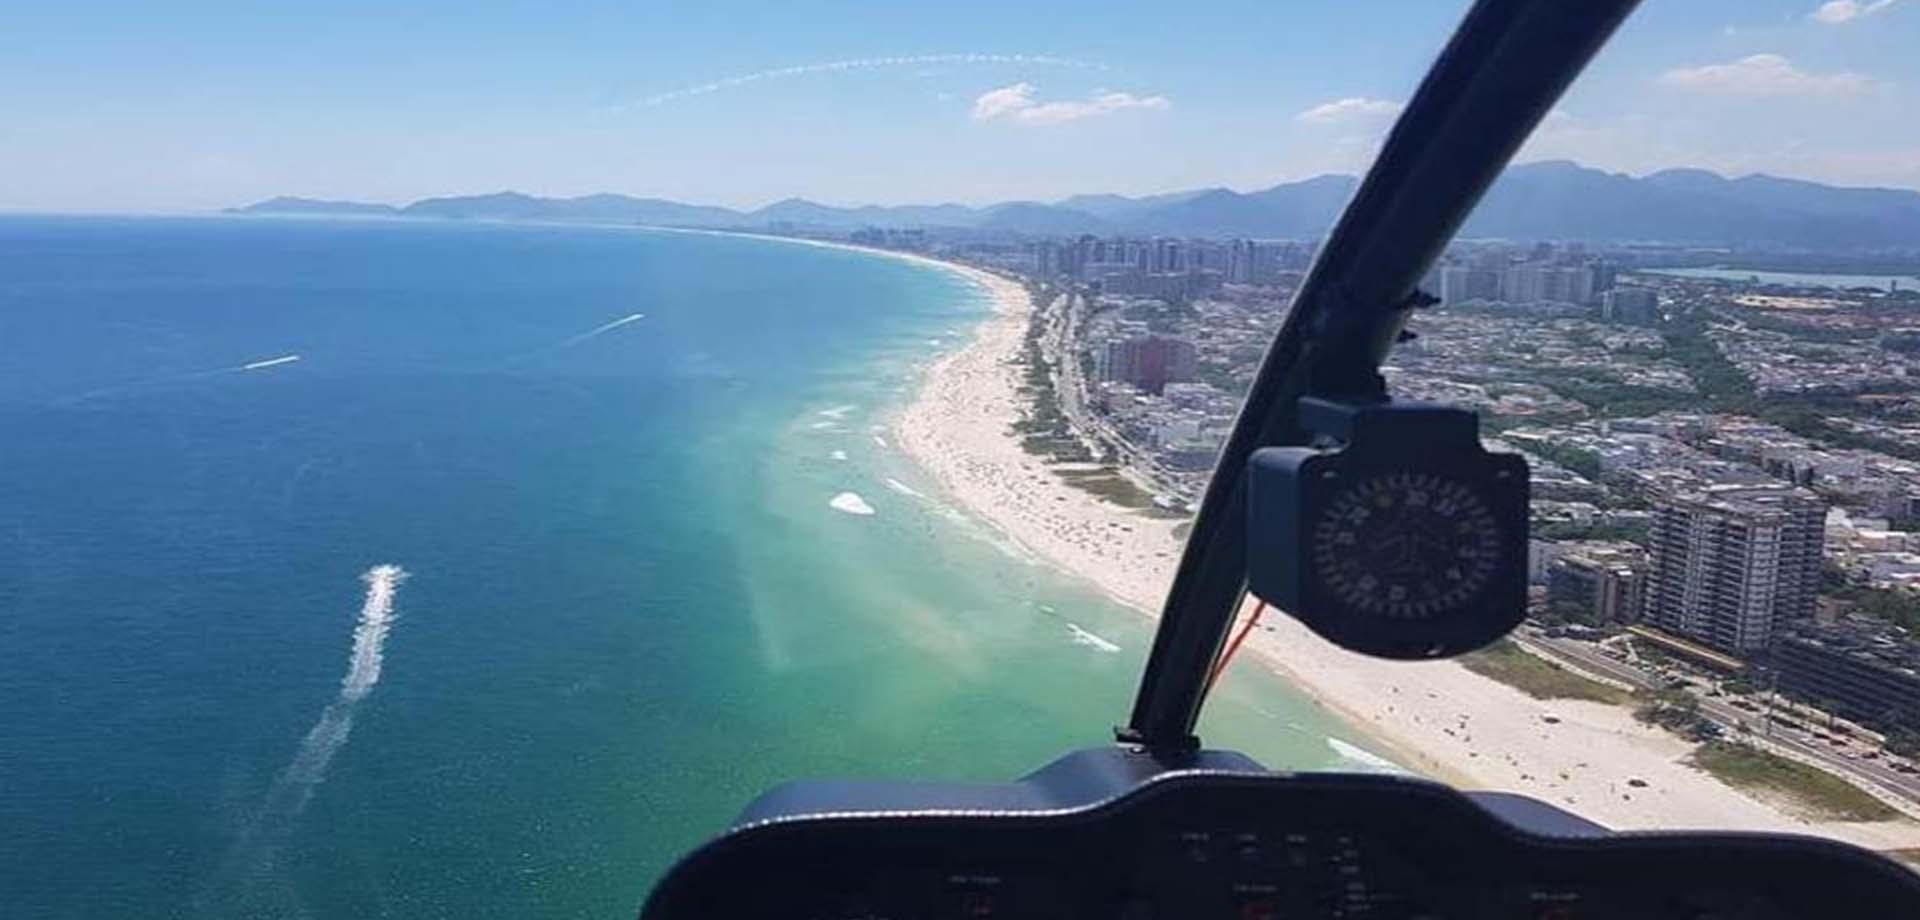 Tour en hélicoptère au-dessus de Rio de Janeiro